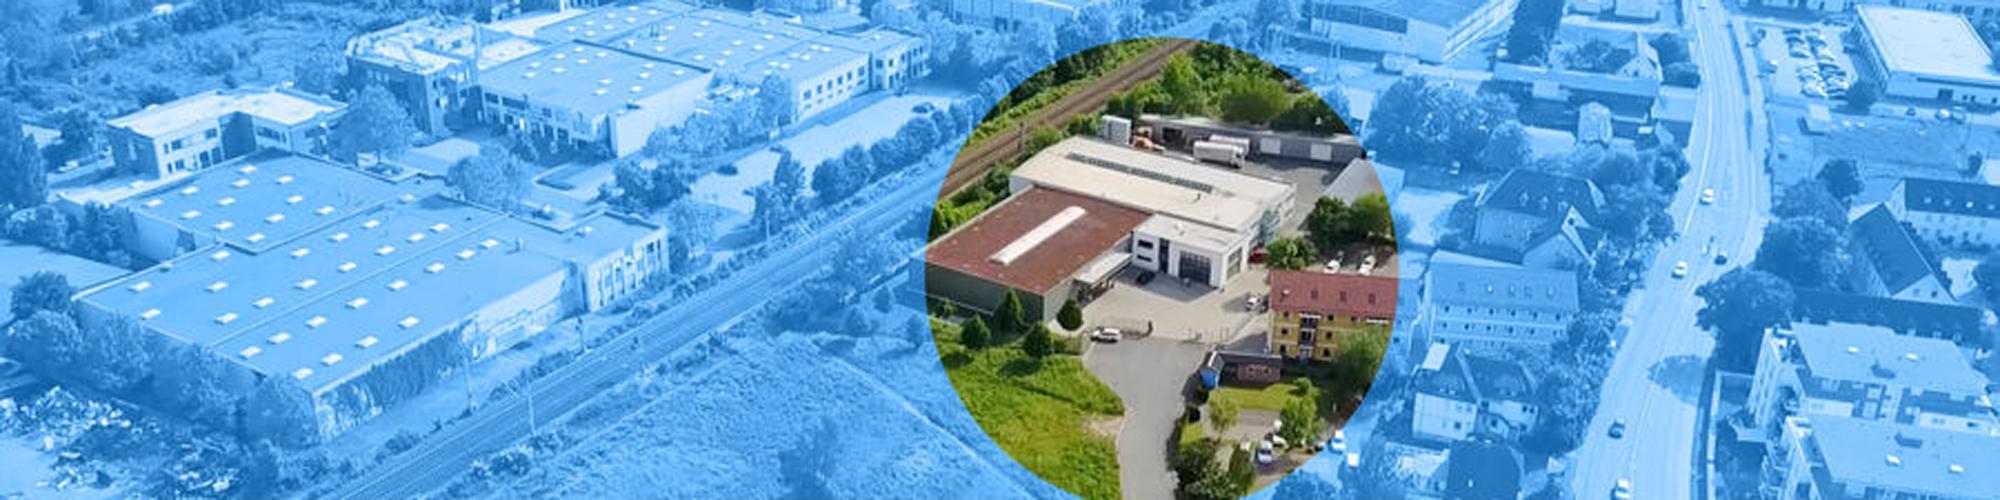 JENABOI Ladenbau GmbH